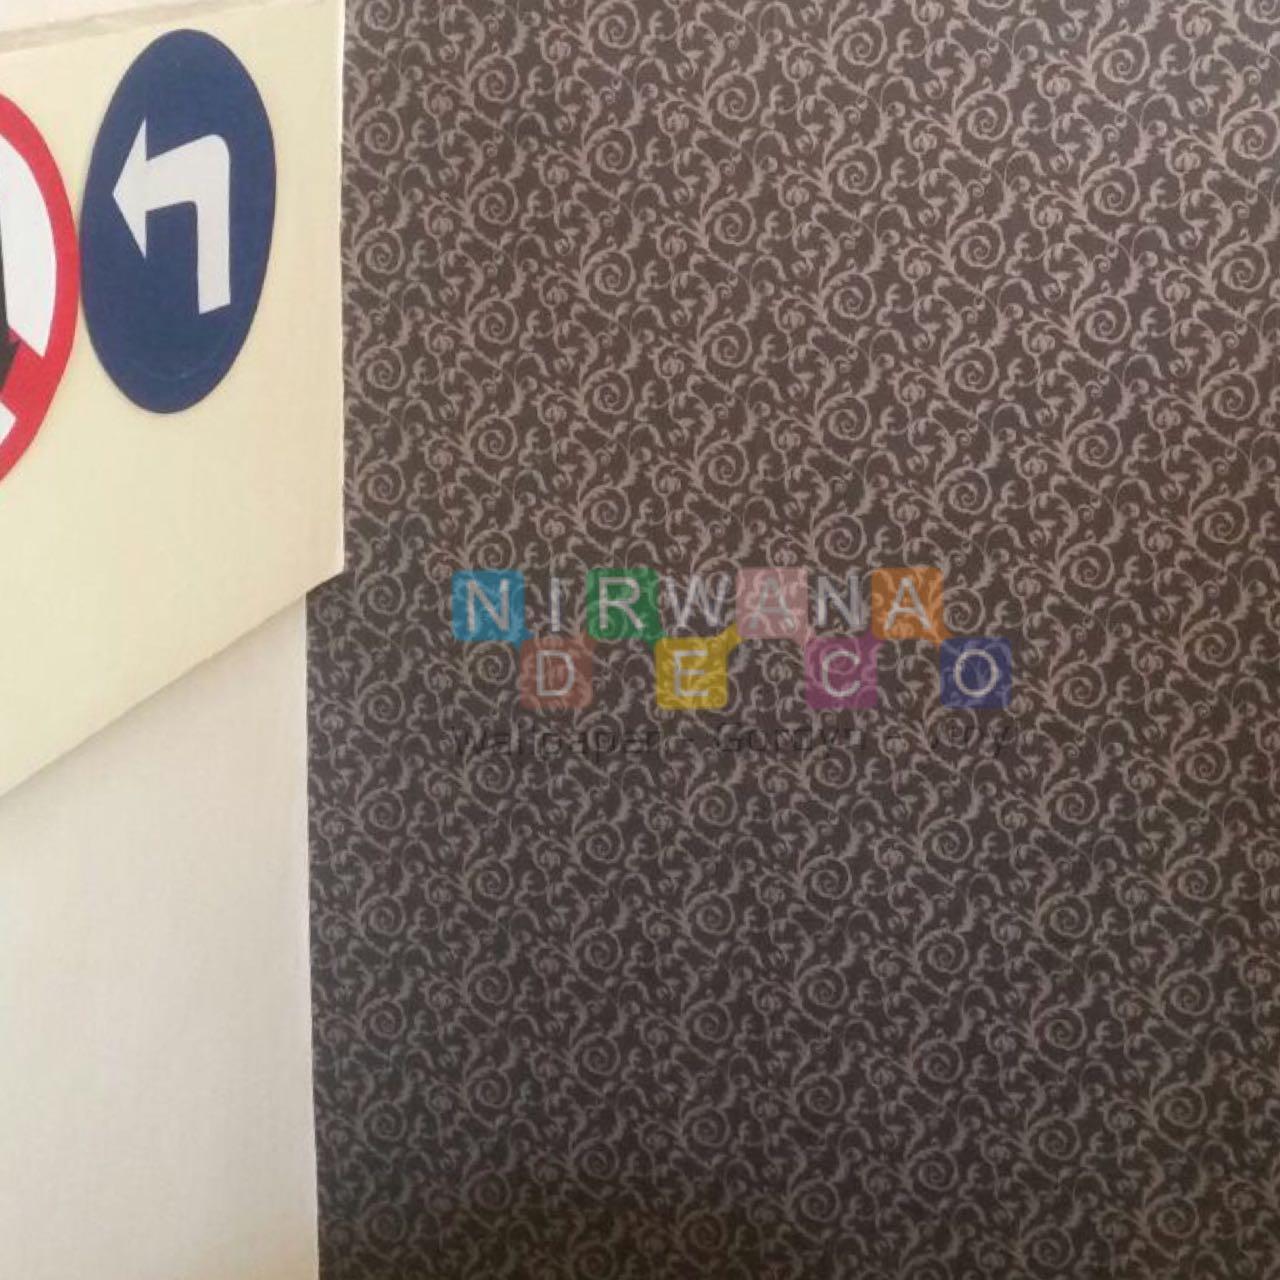 Pemasangan Wallpaper Di Sekolah Dasar Tegalpanggung Yogyakarta